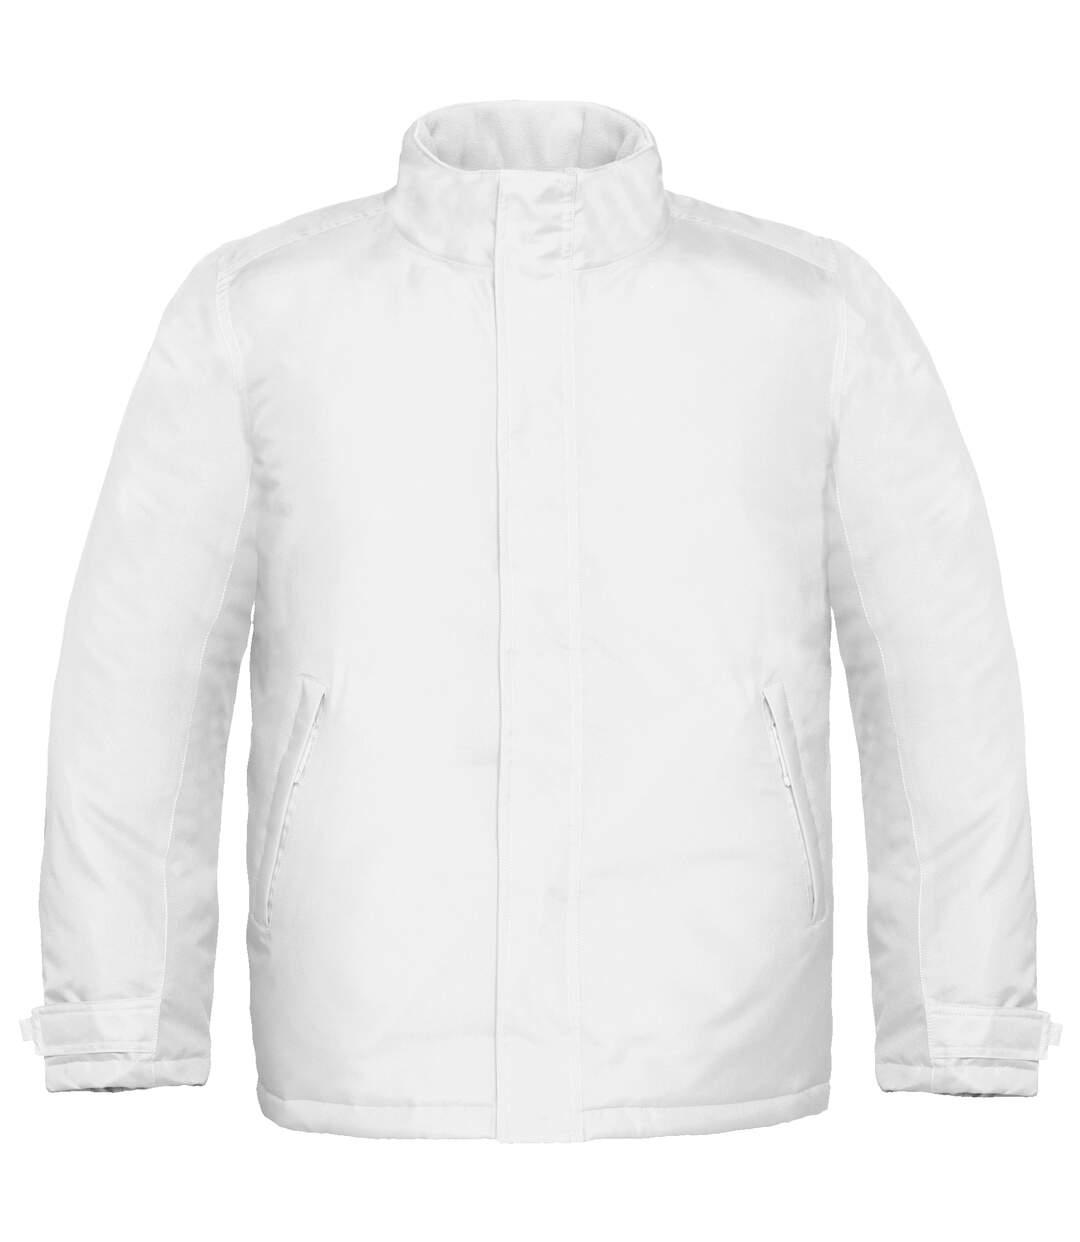 B&C Mens Real+ Premium Windproof Thermo-Isolated Jacket (Waterproof PU Coating) (White) - UTBC2002